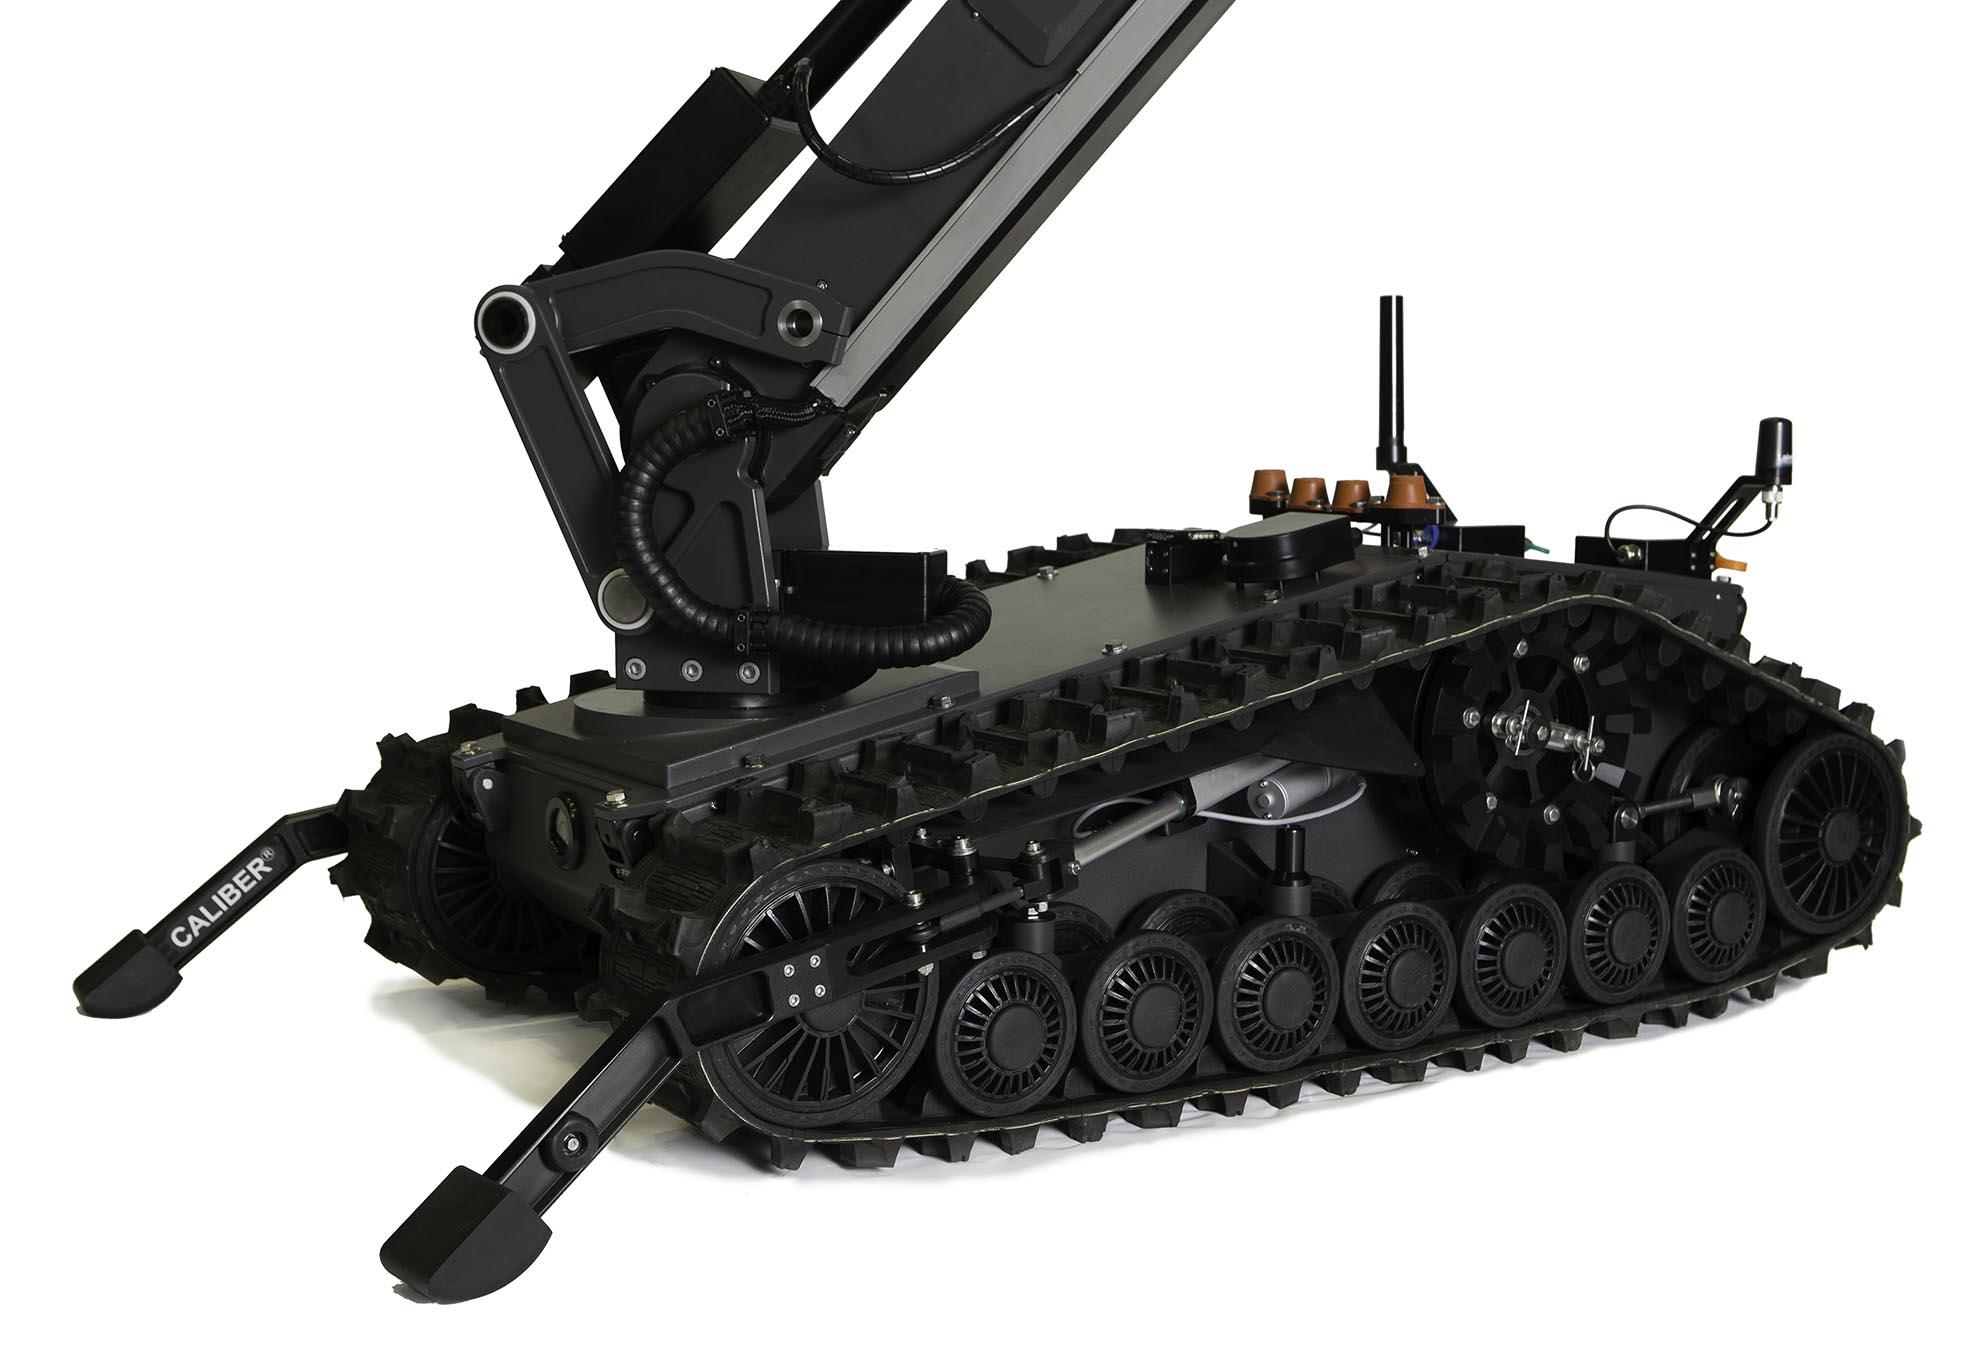 caliber-mk4-lvbied-robot-outriggers